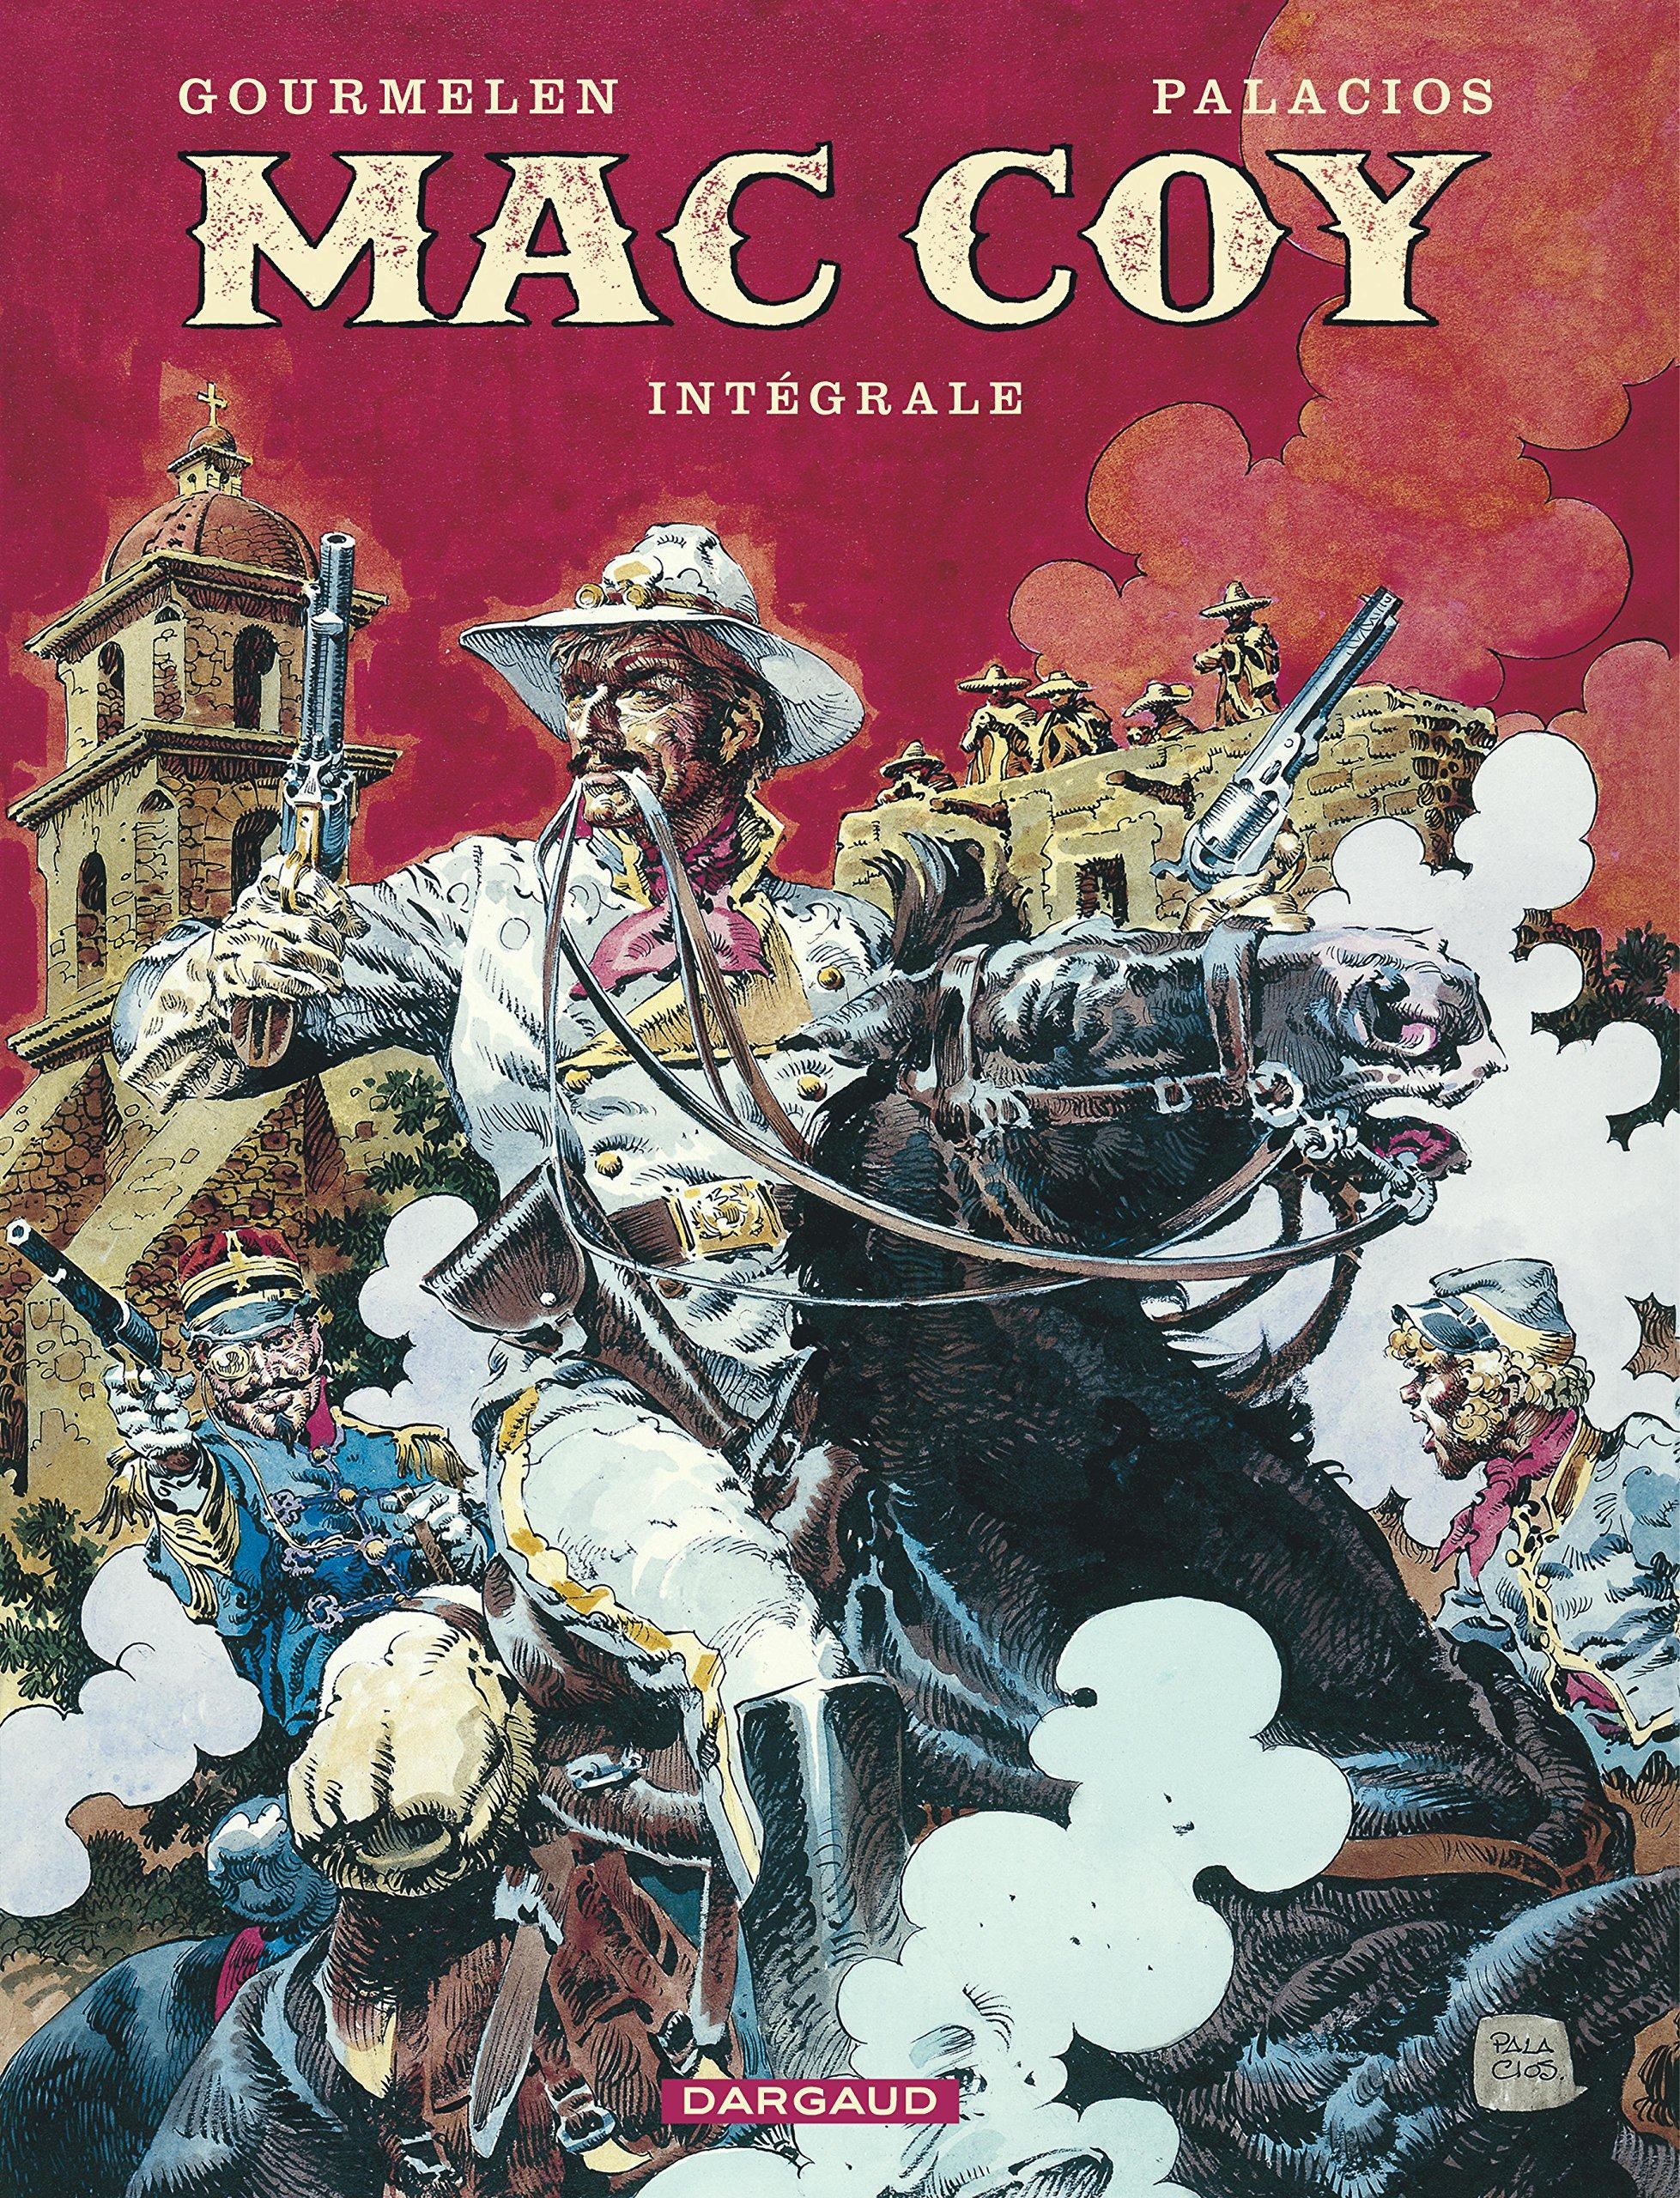 Mac Coy - Intégrales - tome 1 - Mac Coy - intégrale tome 1 Album – 7 juillet 2017 Gourmelen Palacios Dargaud 2205075101